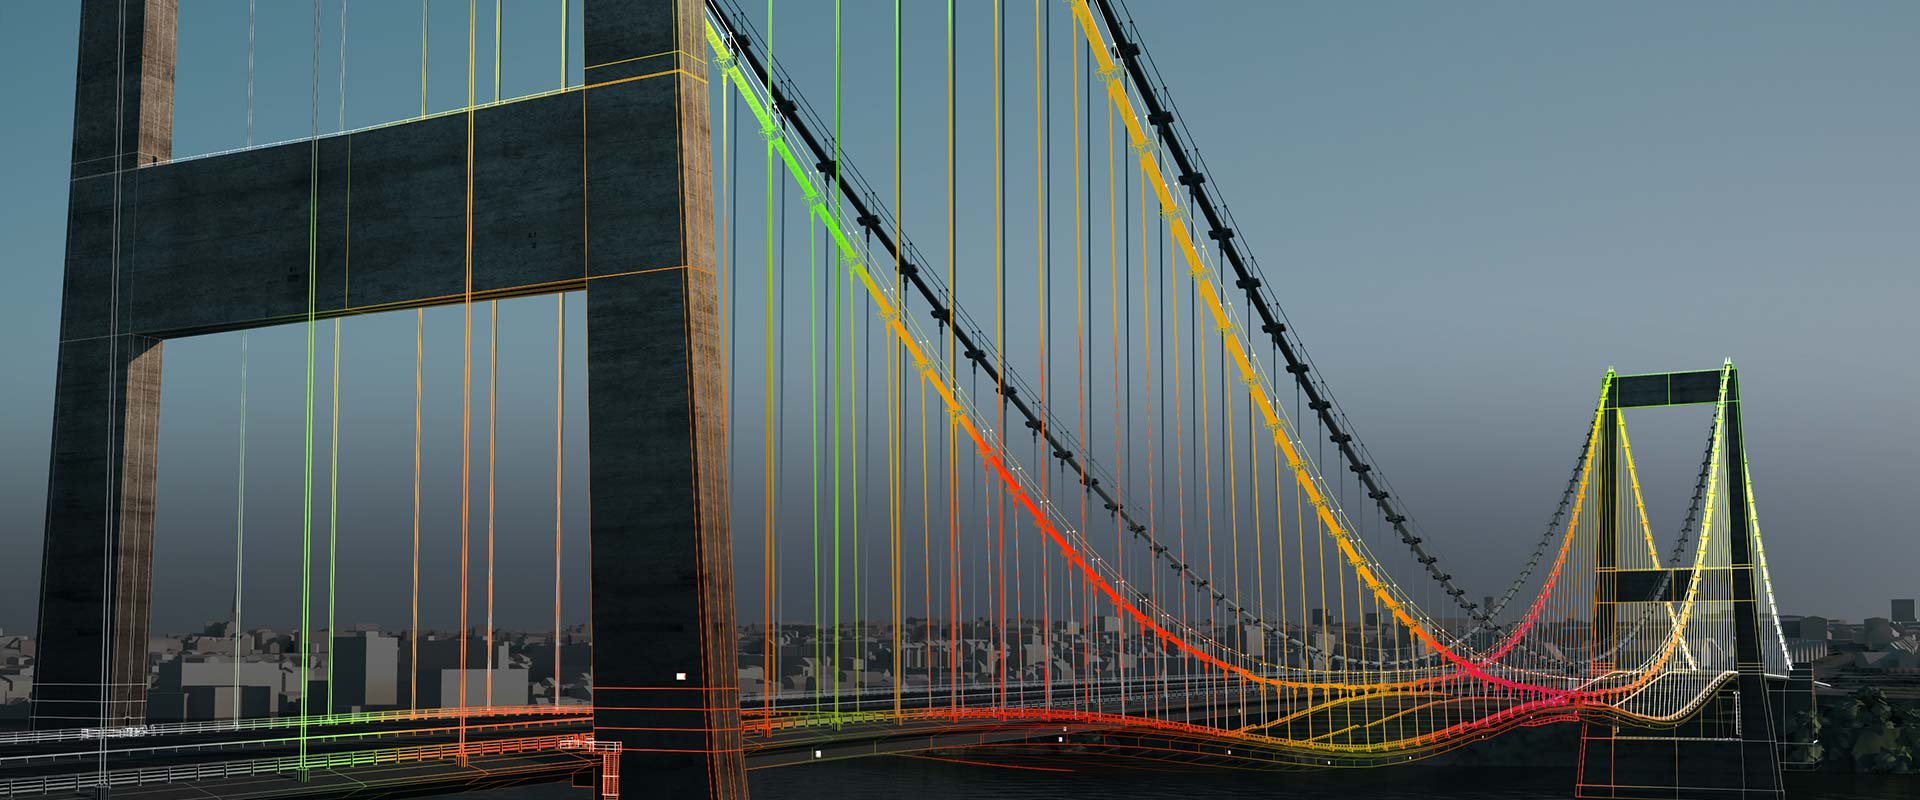 3D modeling on a bridge